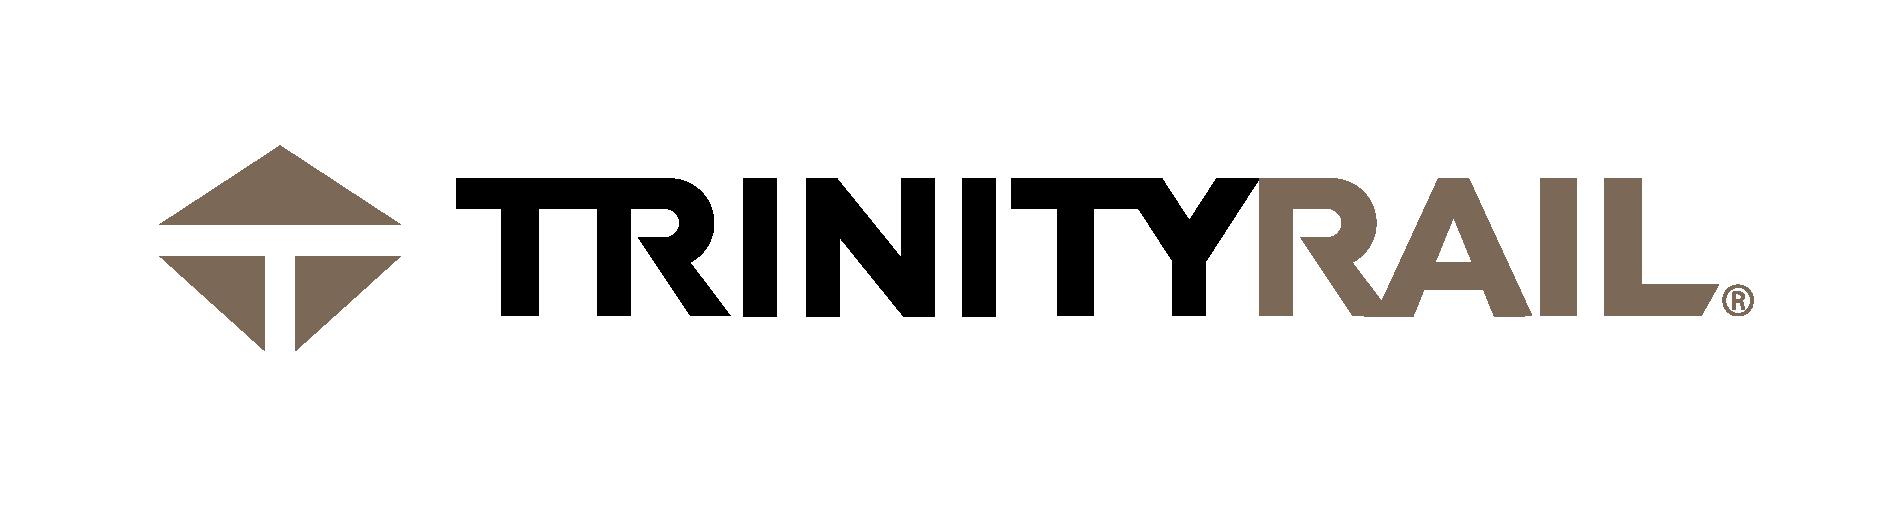 TrinityRail_Logo_CMYK_2C-2019